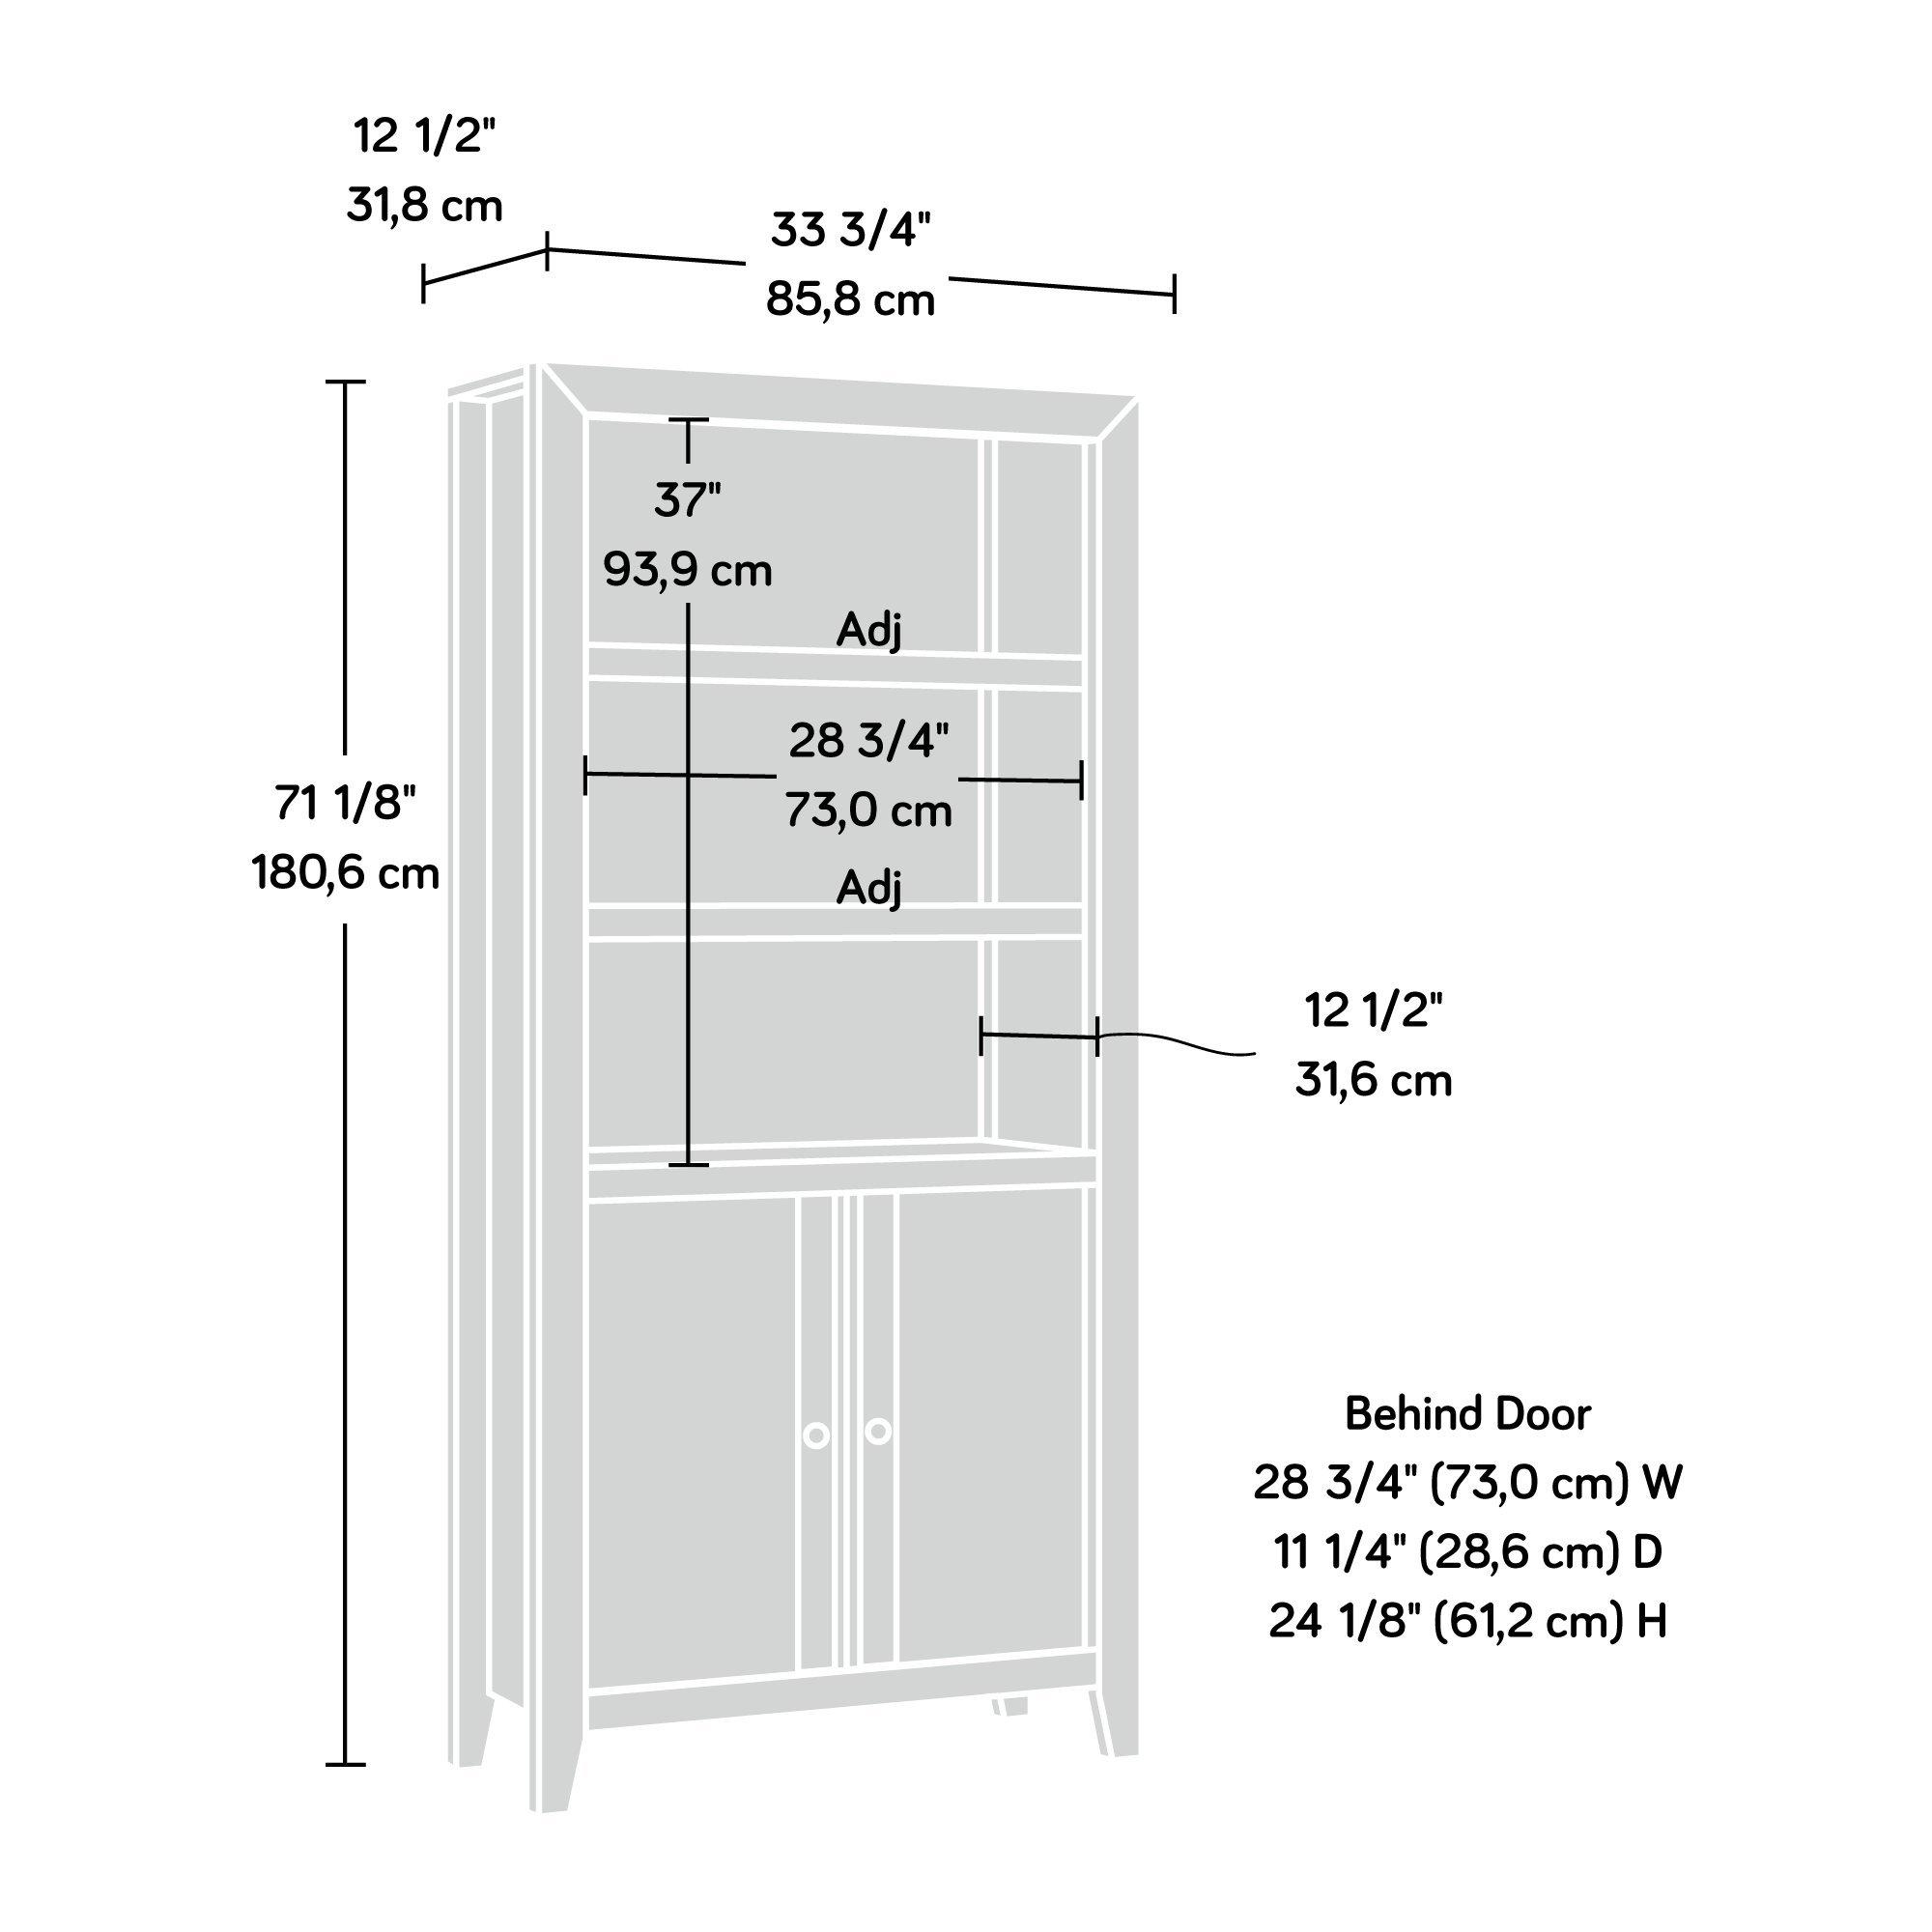 Sauder 420409 Dakota Pass Library with Doors, L: 33.82'' x W: 12.52'' x H: 71.10'', Craftsman Oak Finish by Sauder (Image #4)